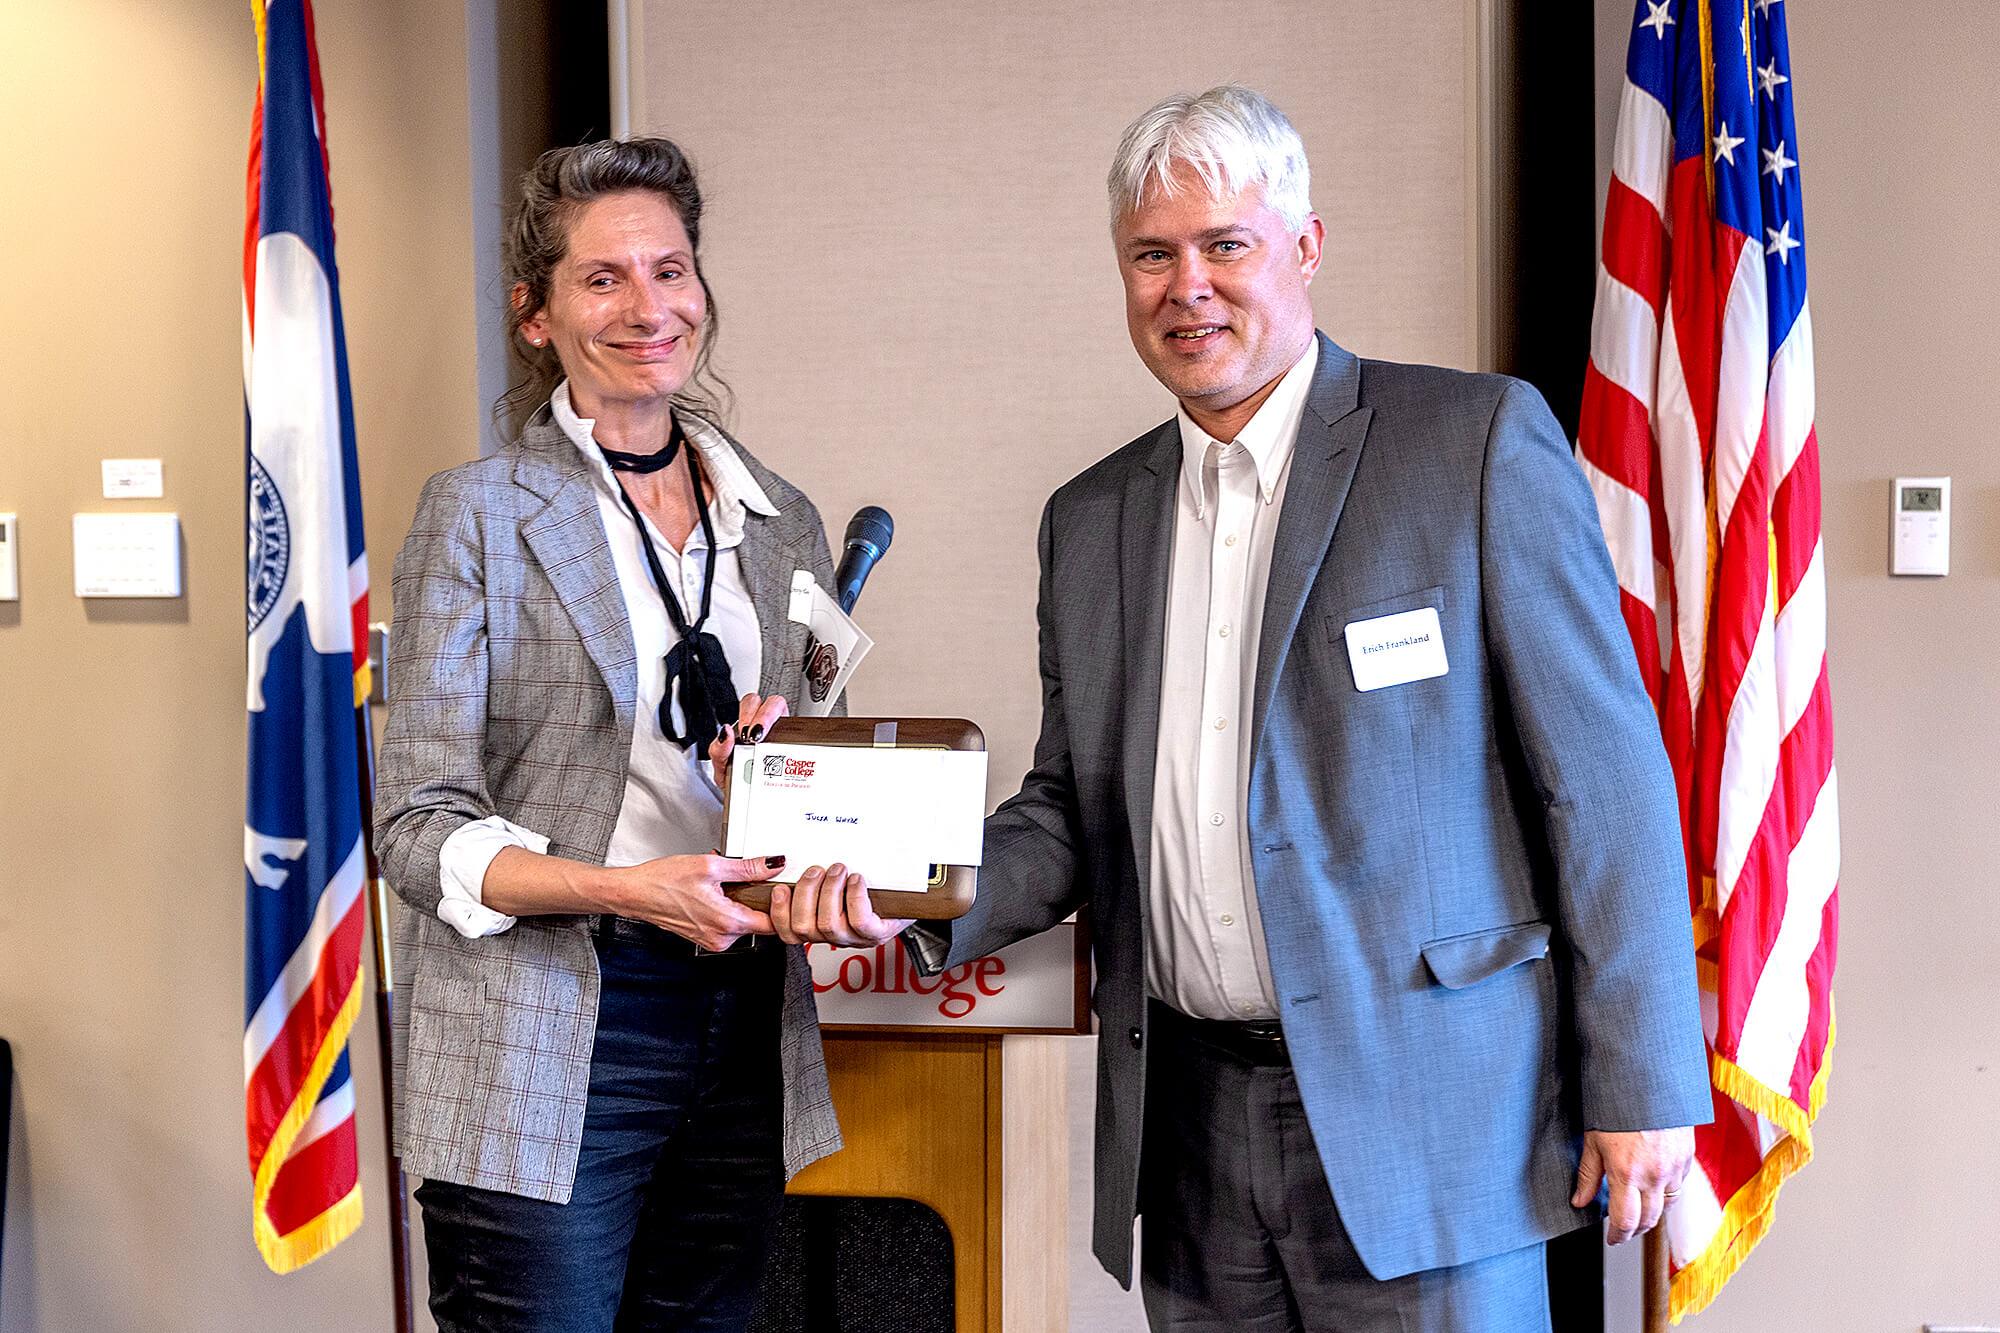 Judith Bailey Scully Award: Julia Whyde, English instructor